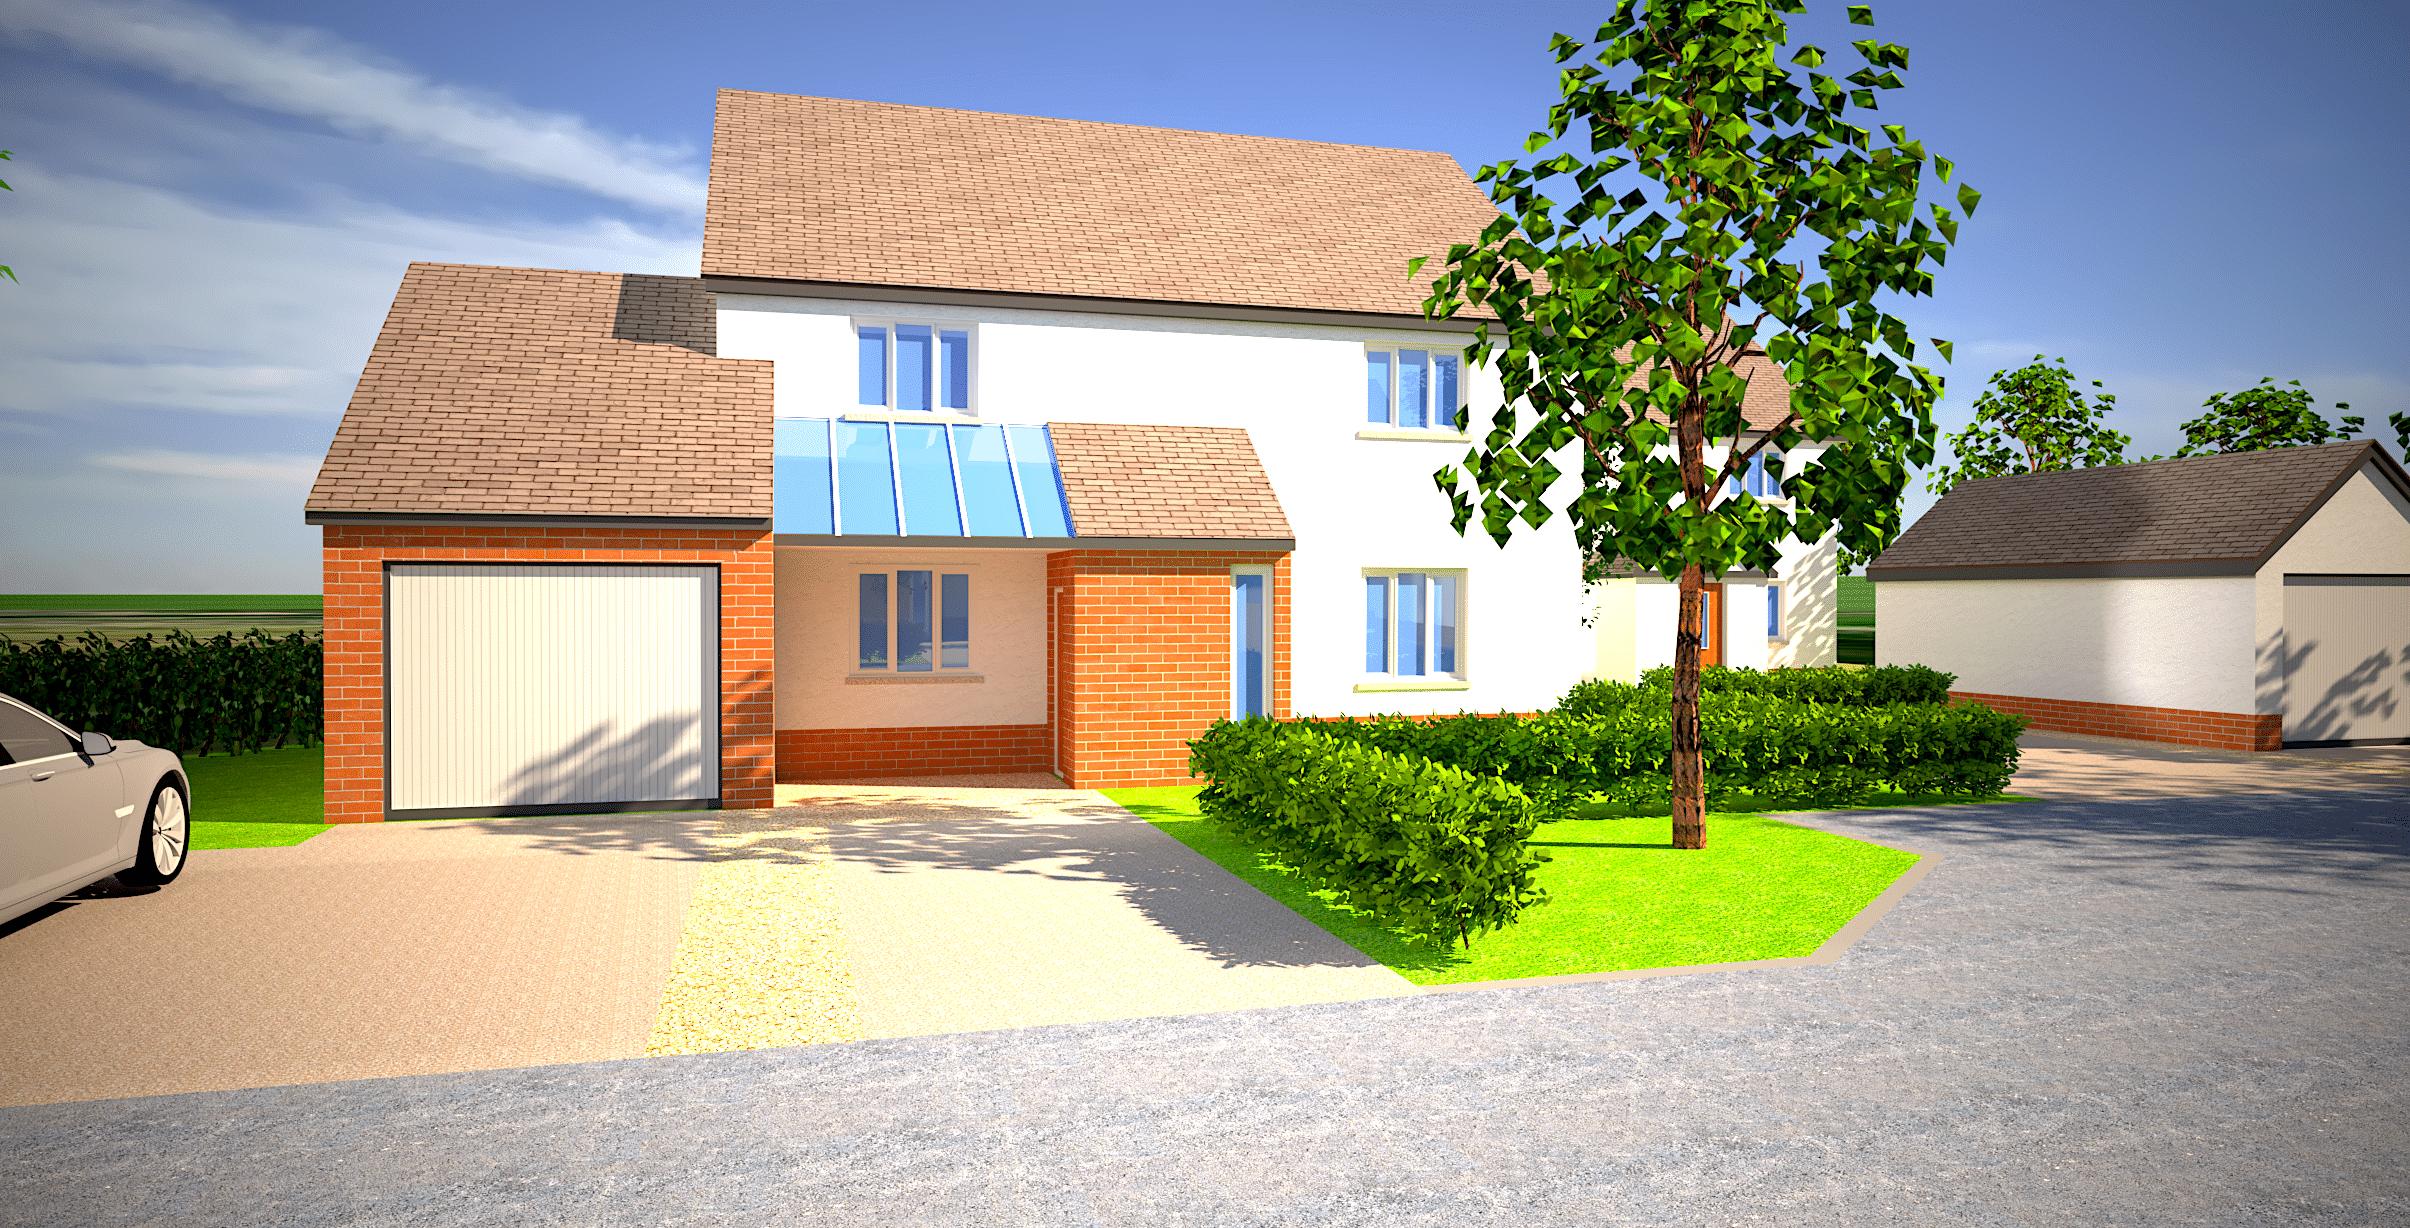 ebbw vale housing development 3d visualisations